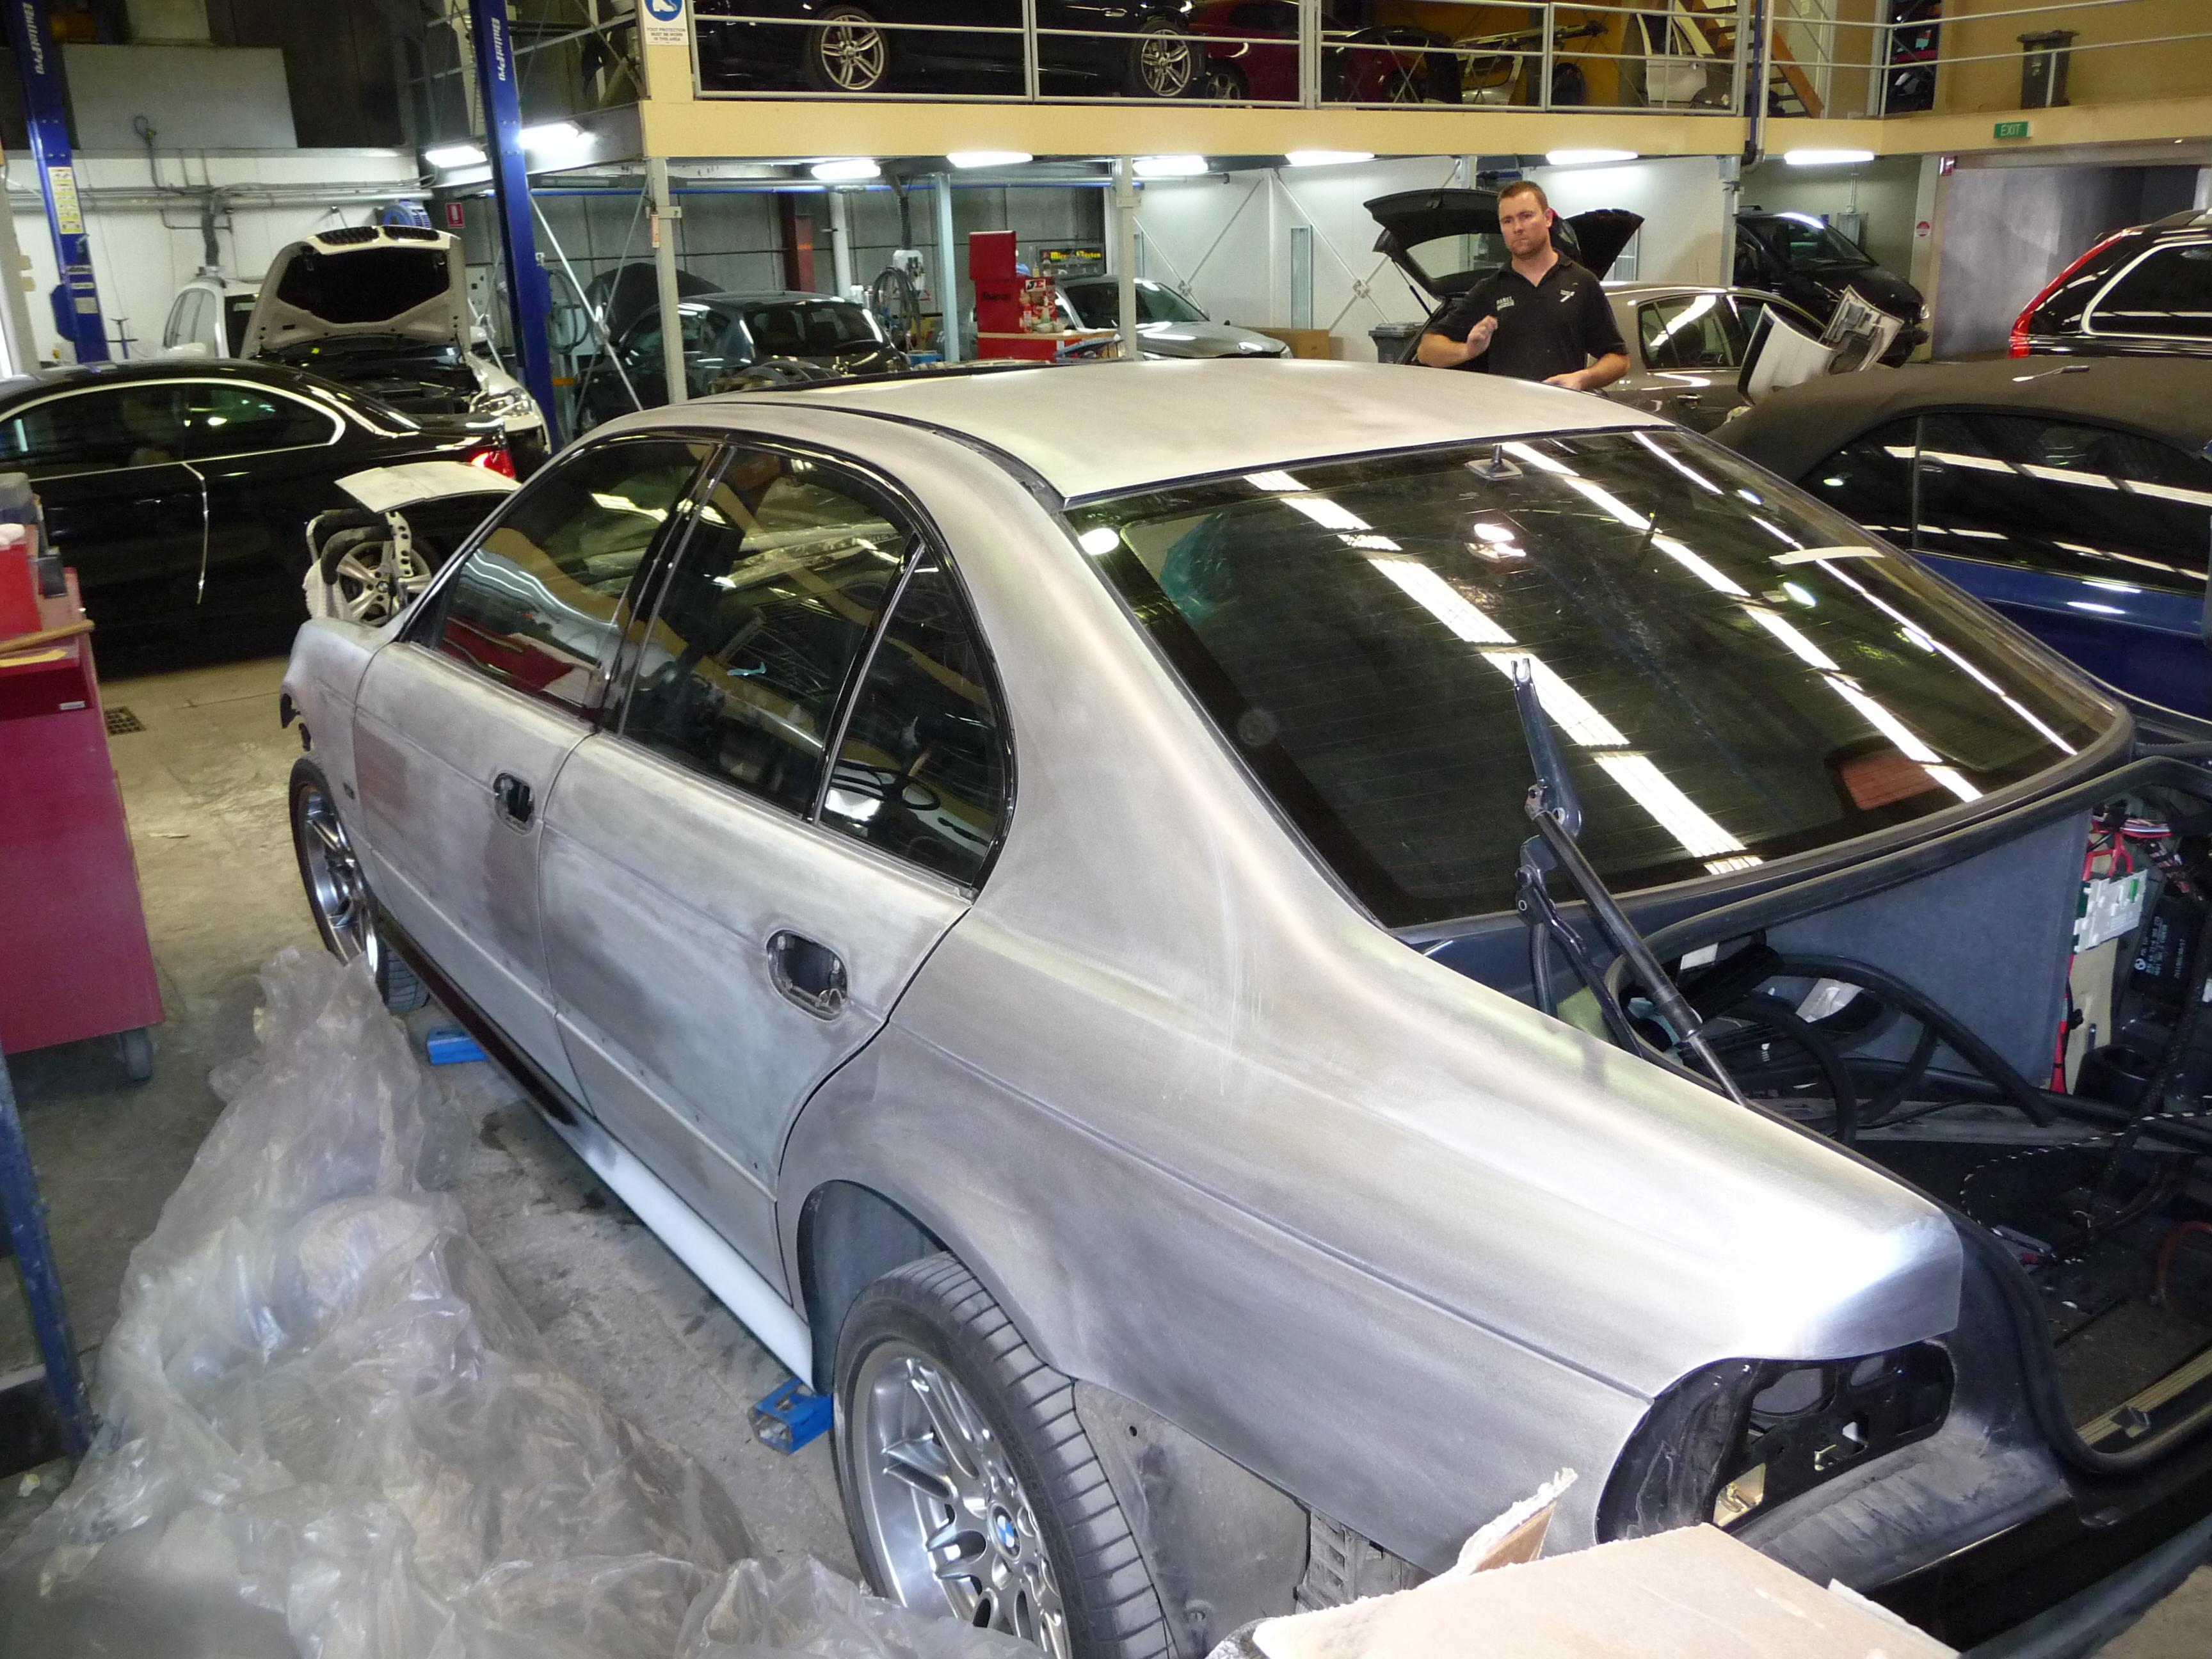 My Carbon Black bare metal respray - progress photos-m5-respray-008.jpg